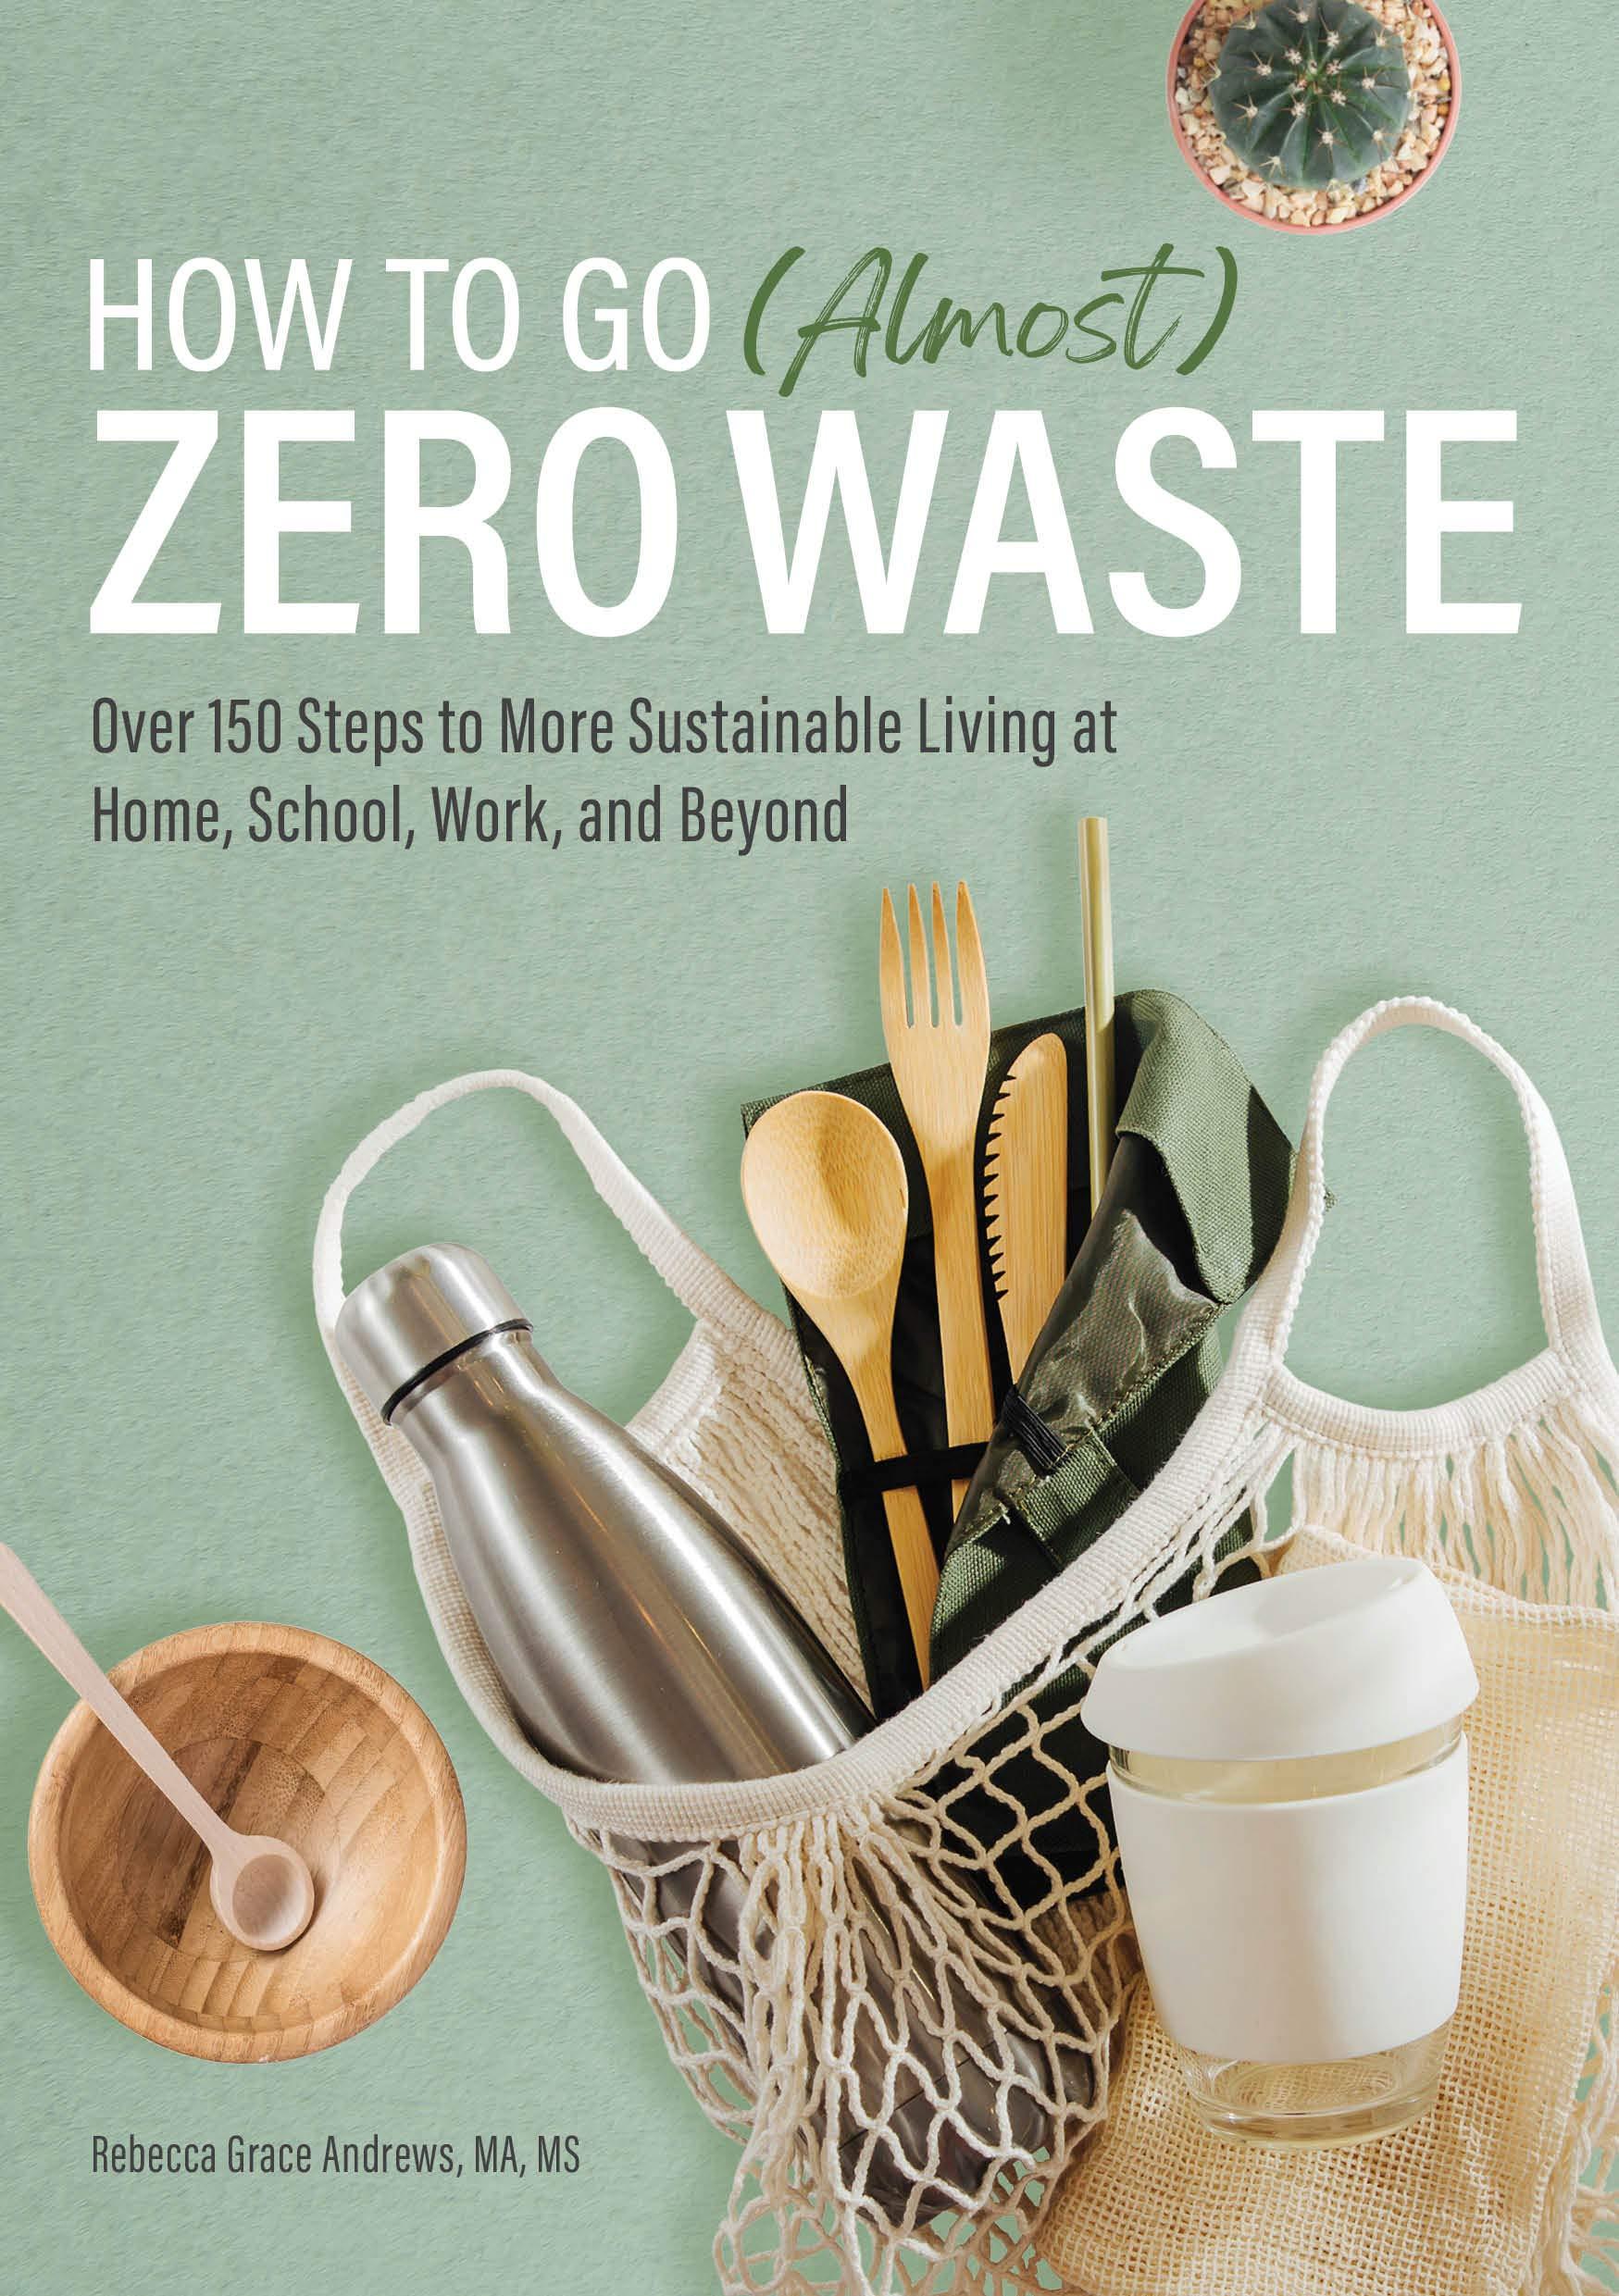 How to Go Almost Zero Waste